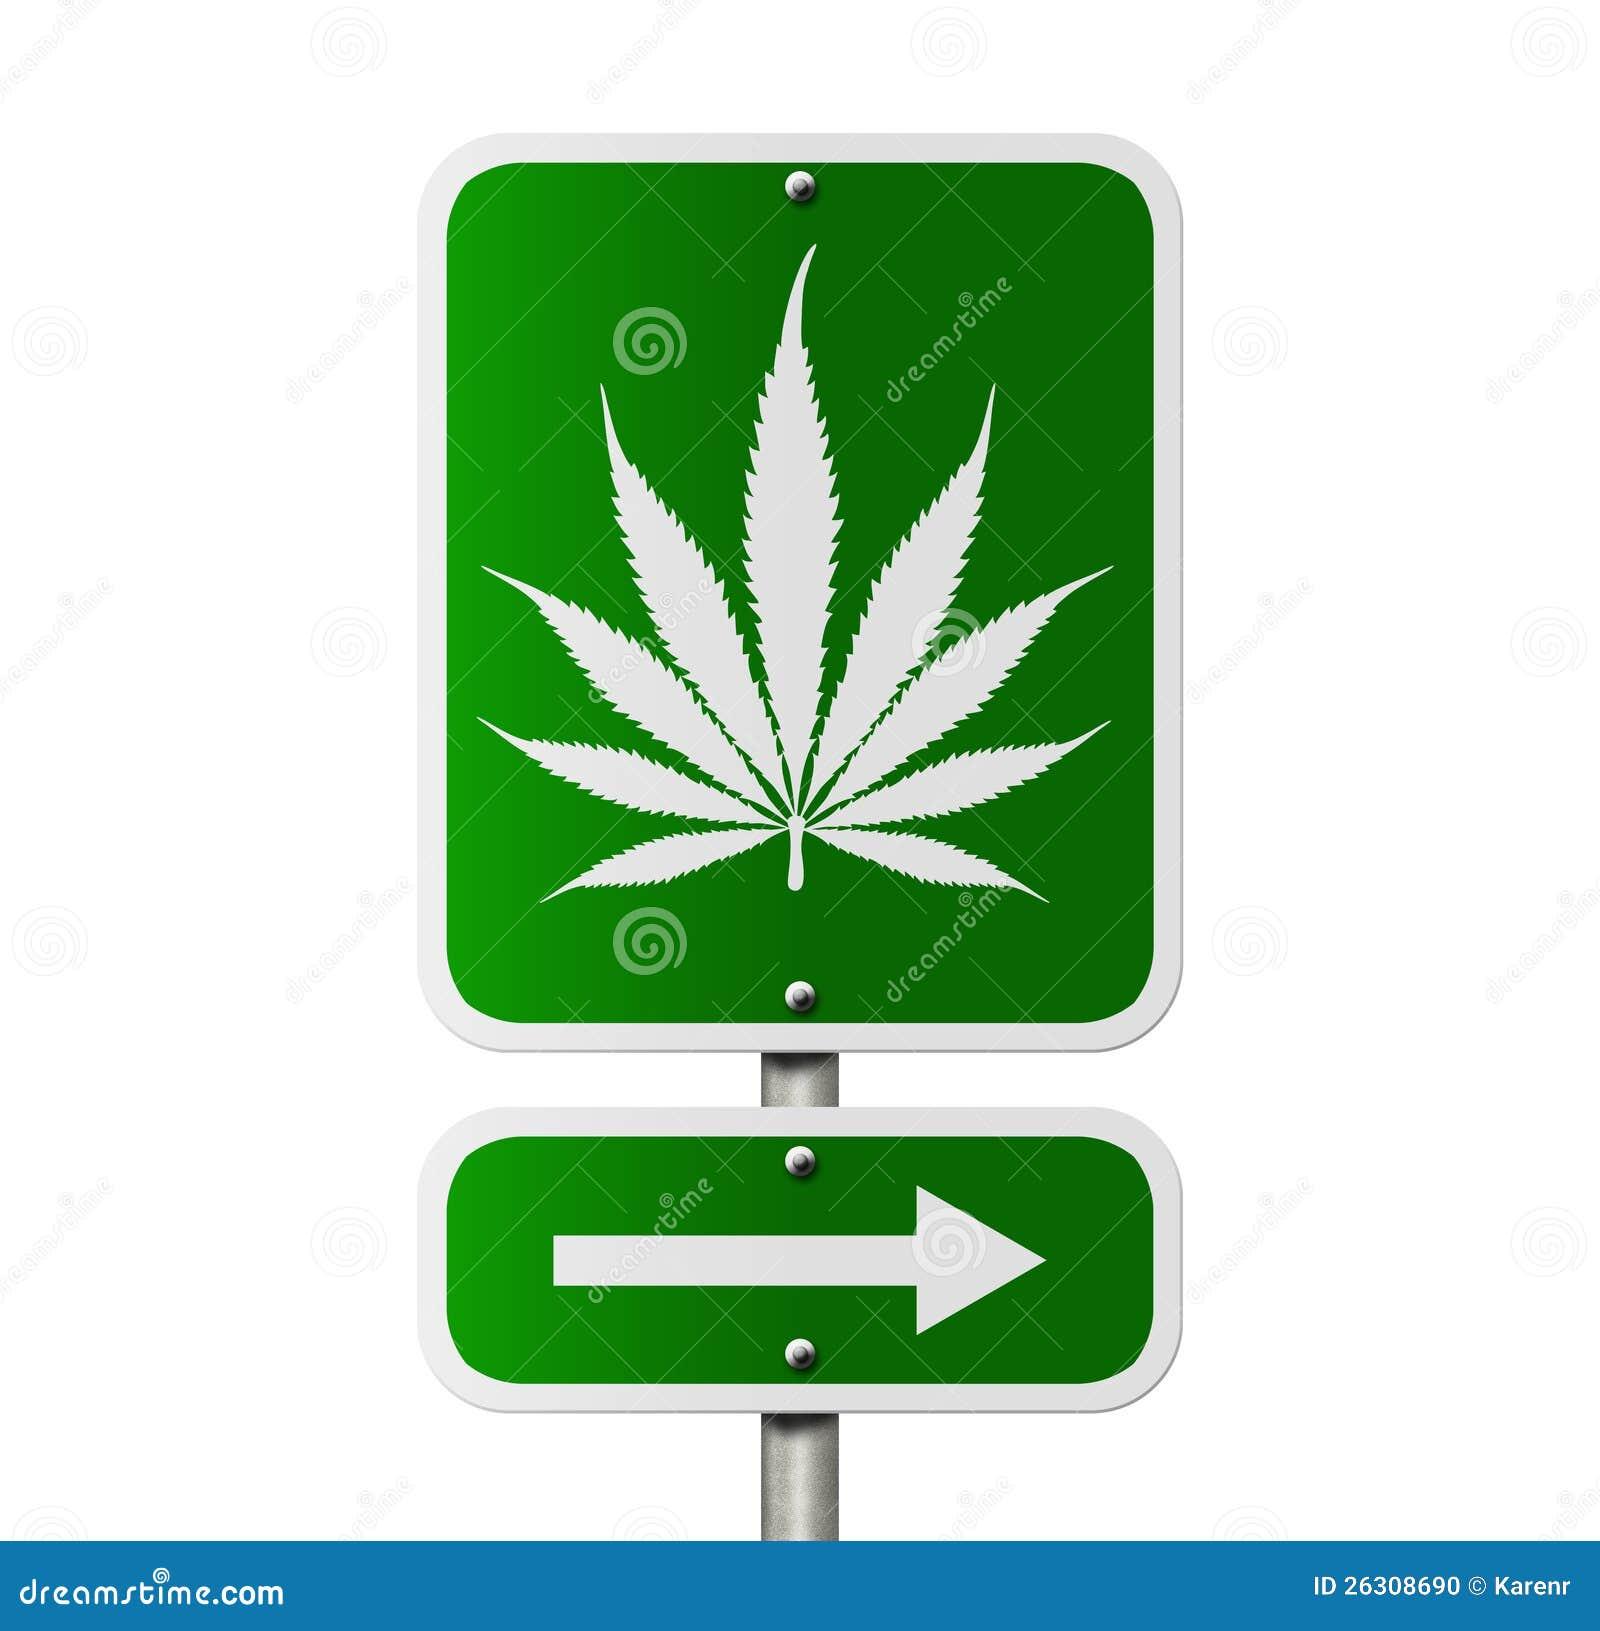 Marijuana this way